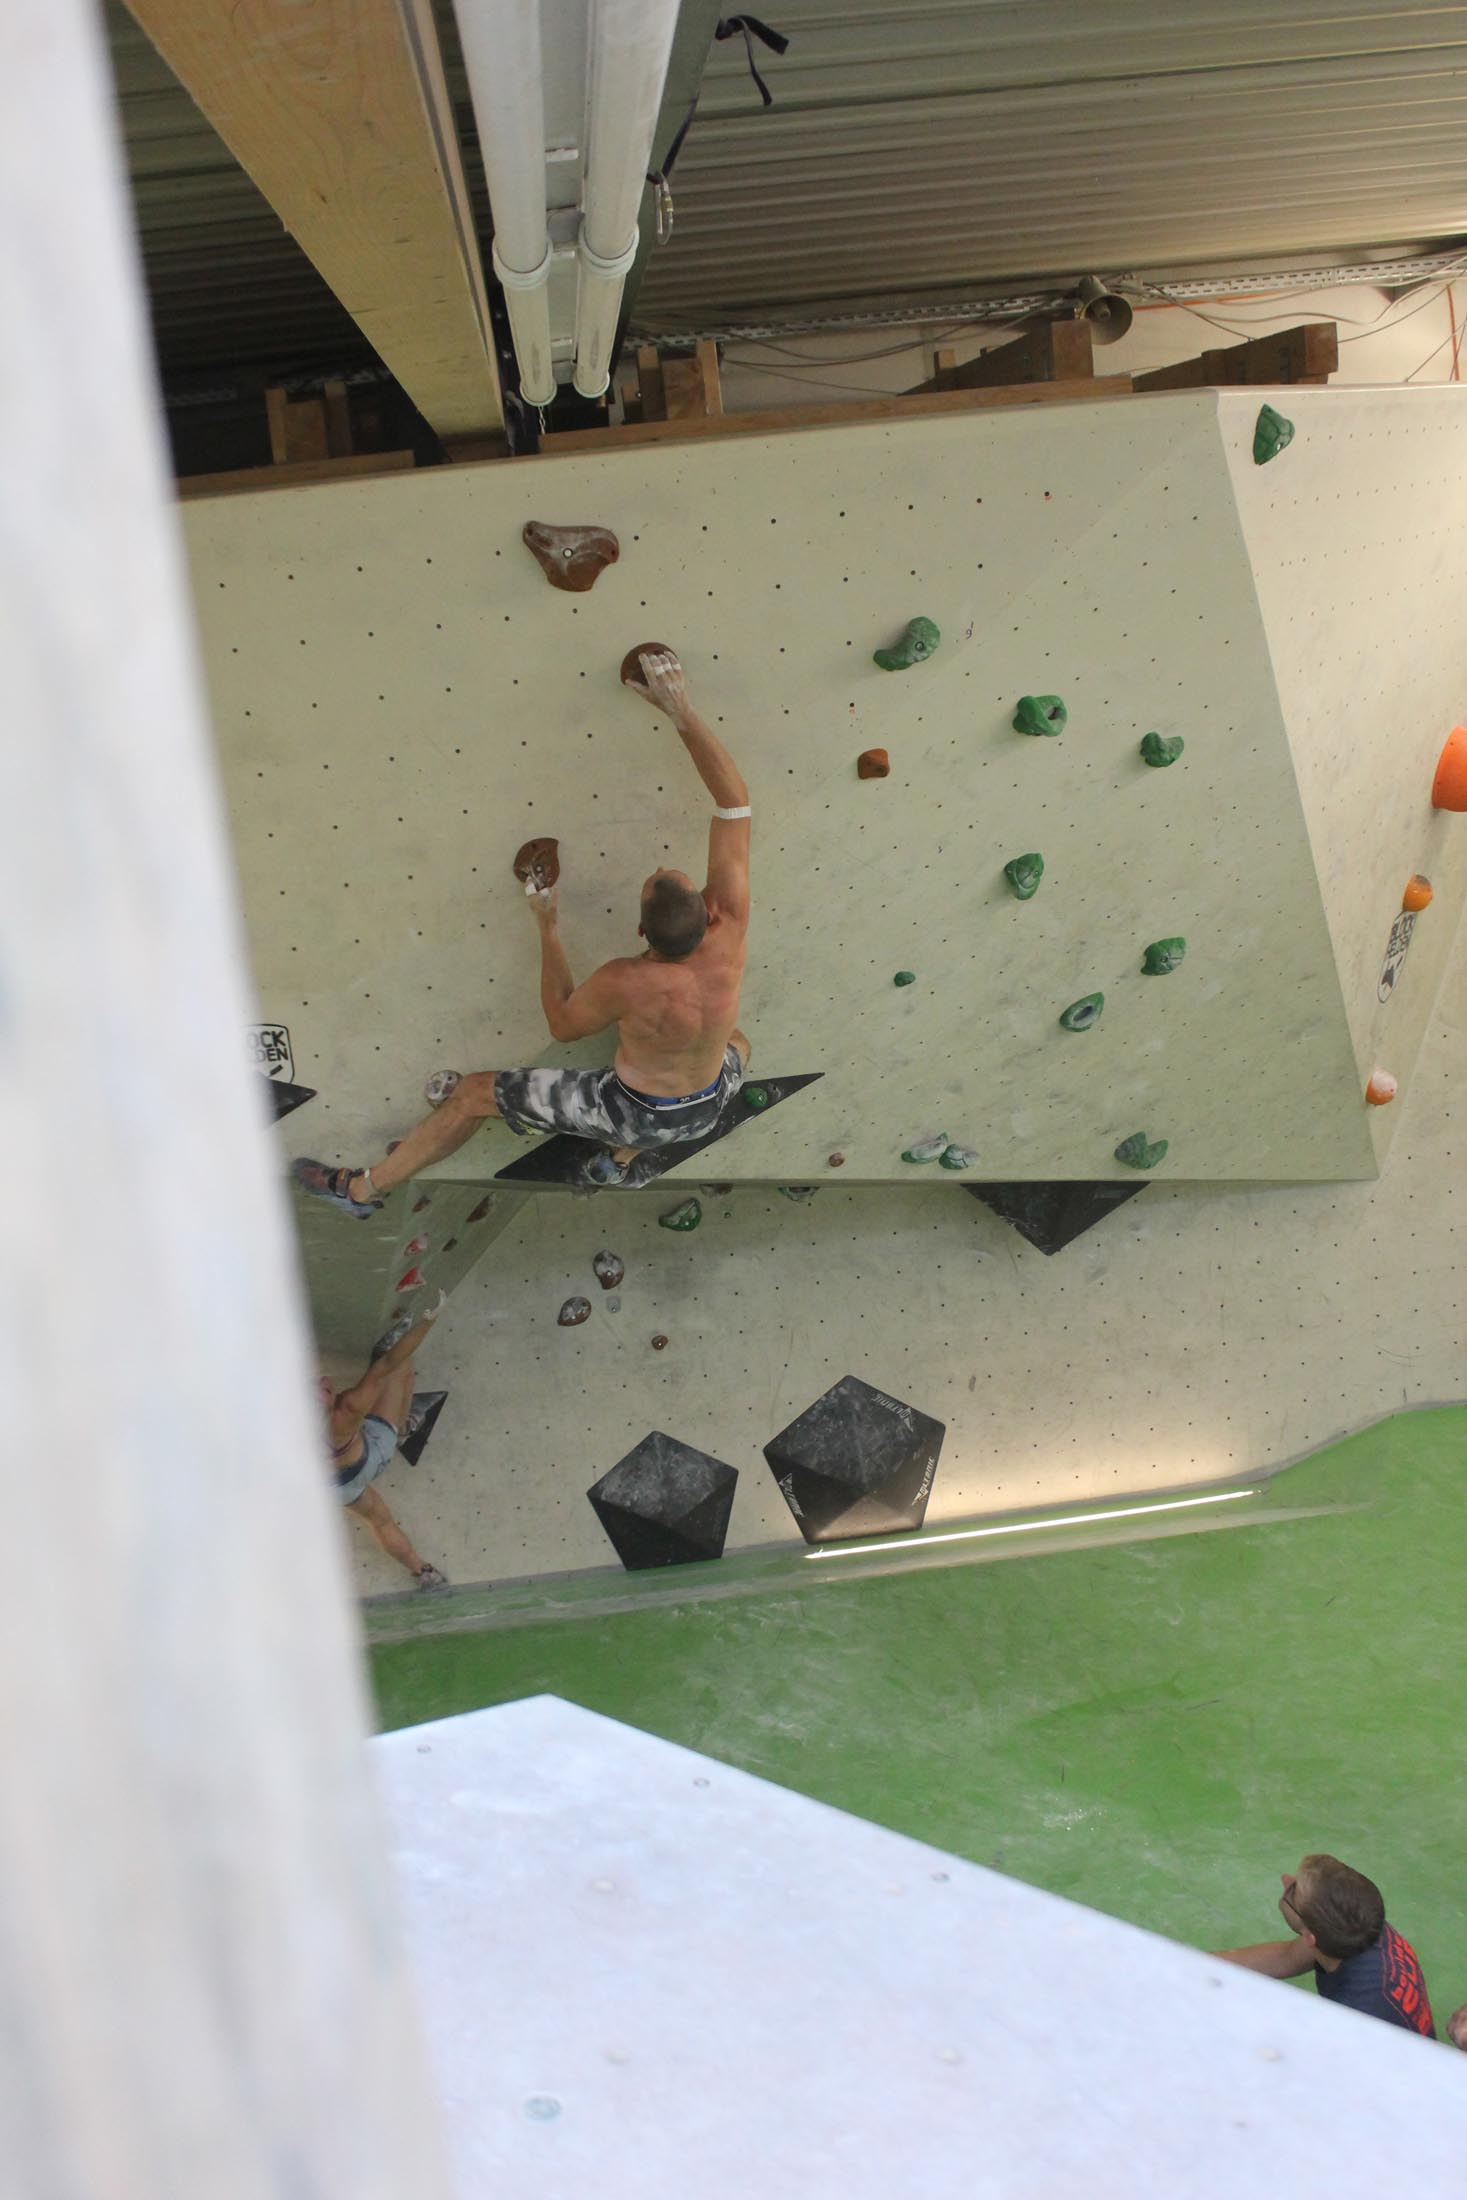 Quali, internationaler bouldercup Frankenjura 2016, BLOCKHELDEN Erlangen, Mammut, Bergfreunde.de, Boulderwettkampf07092016293